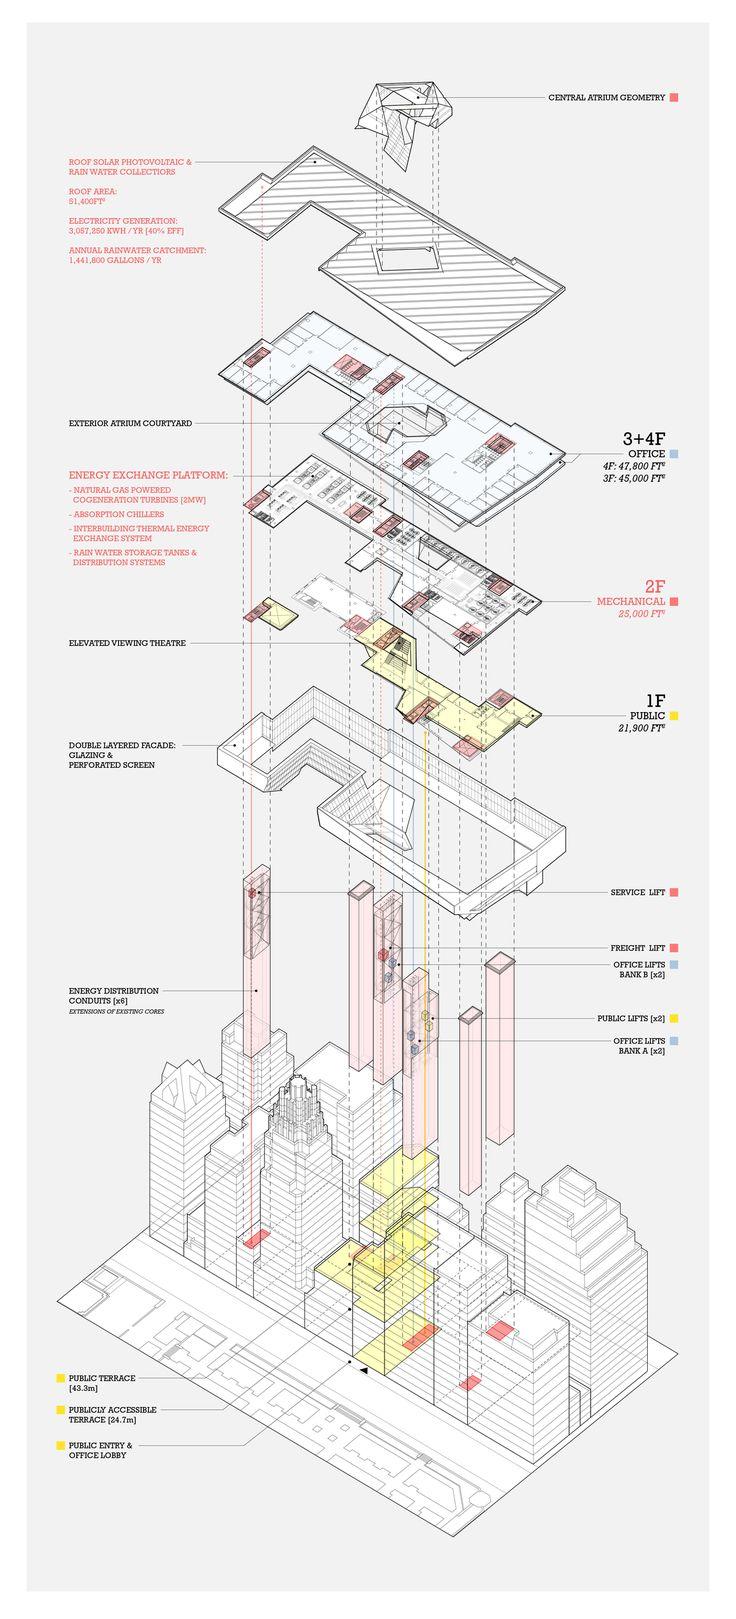 Air Ops: A Retroactive Platform for Energy Exchange | James Leng